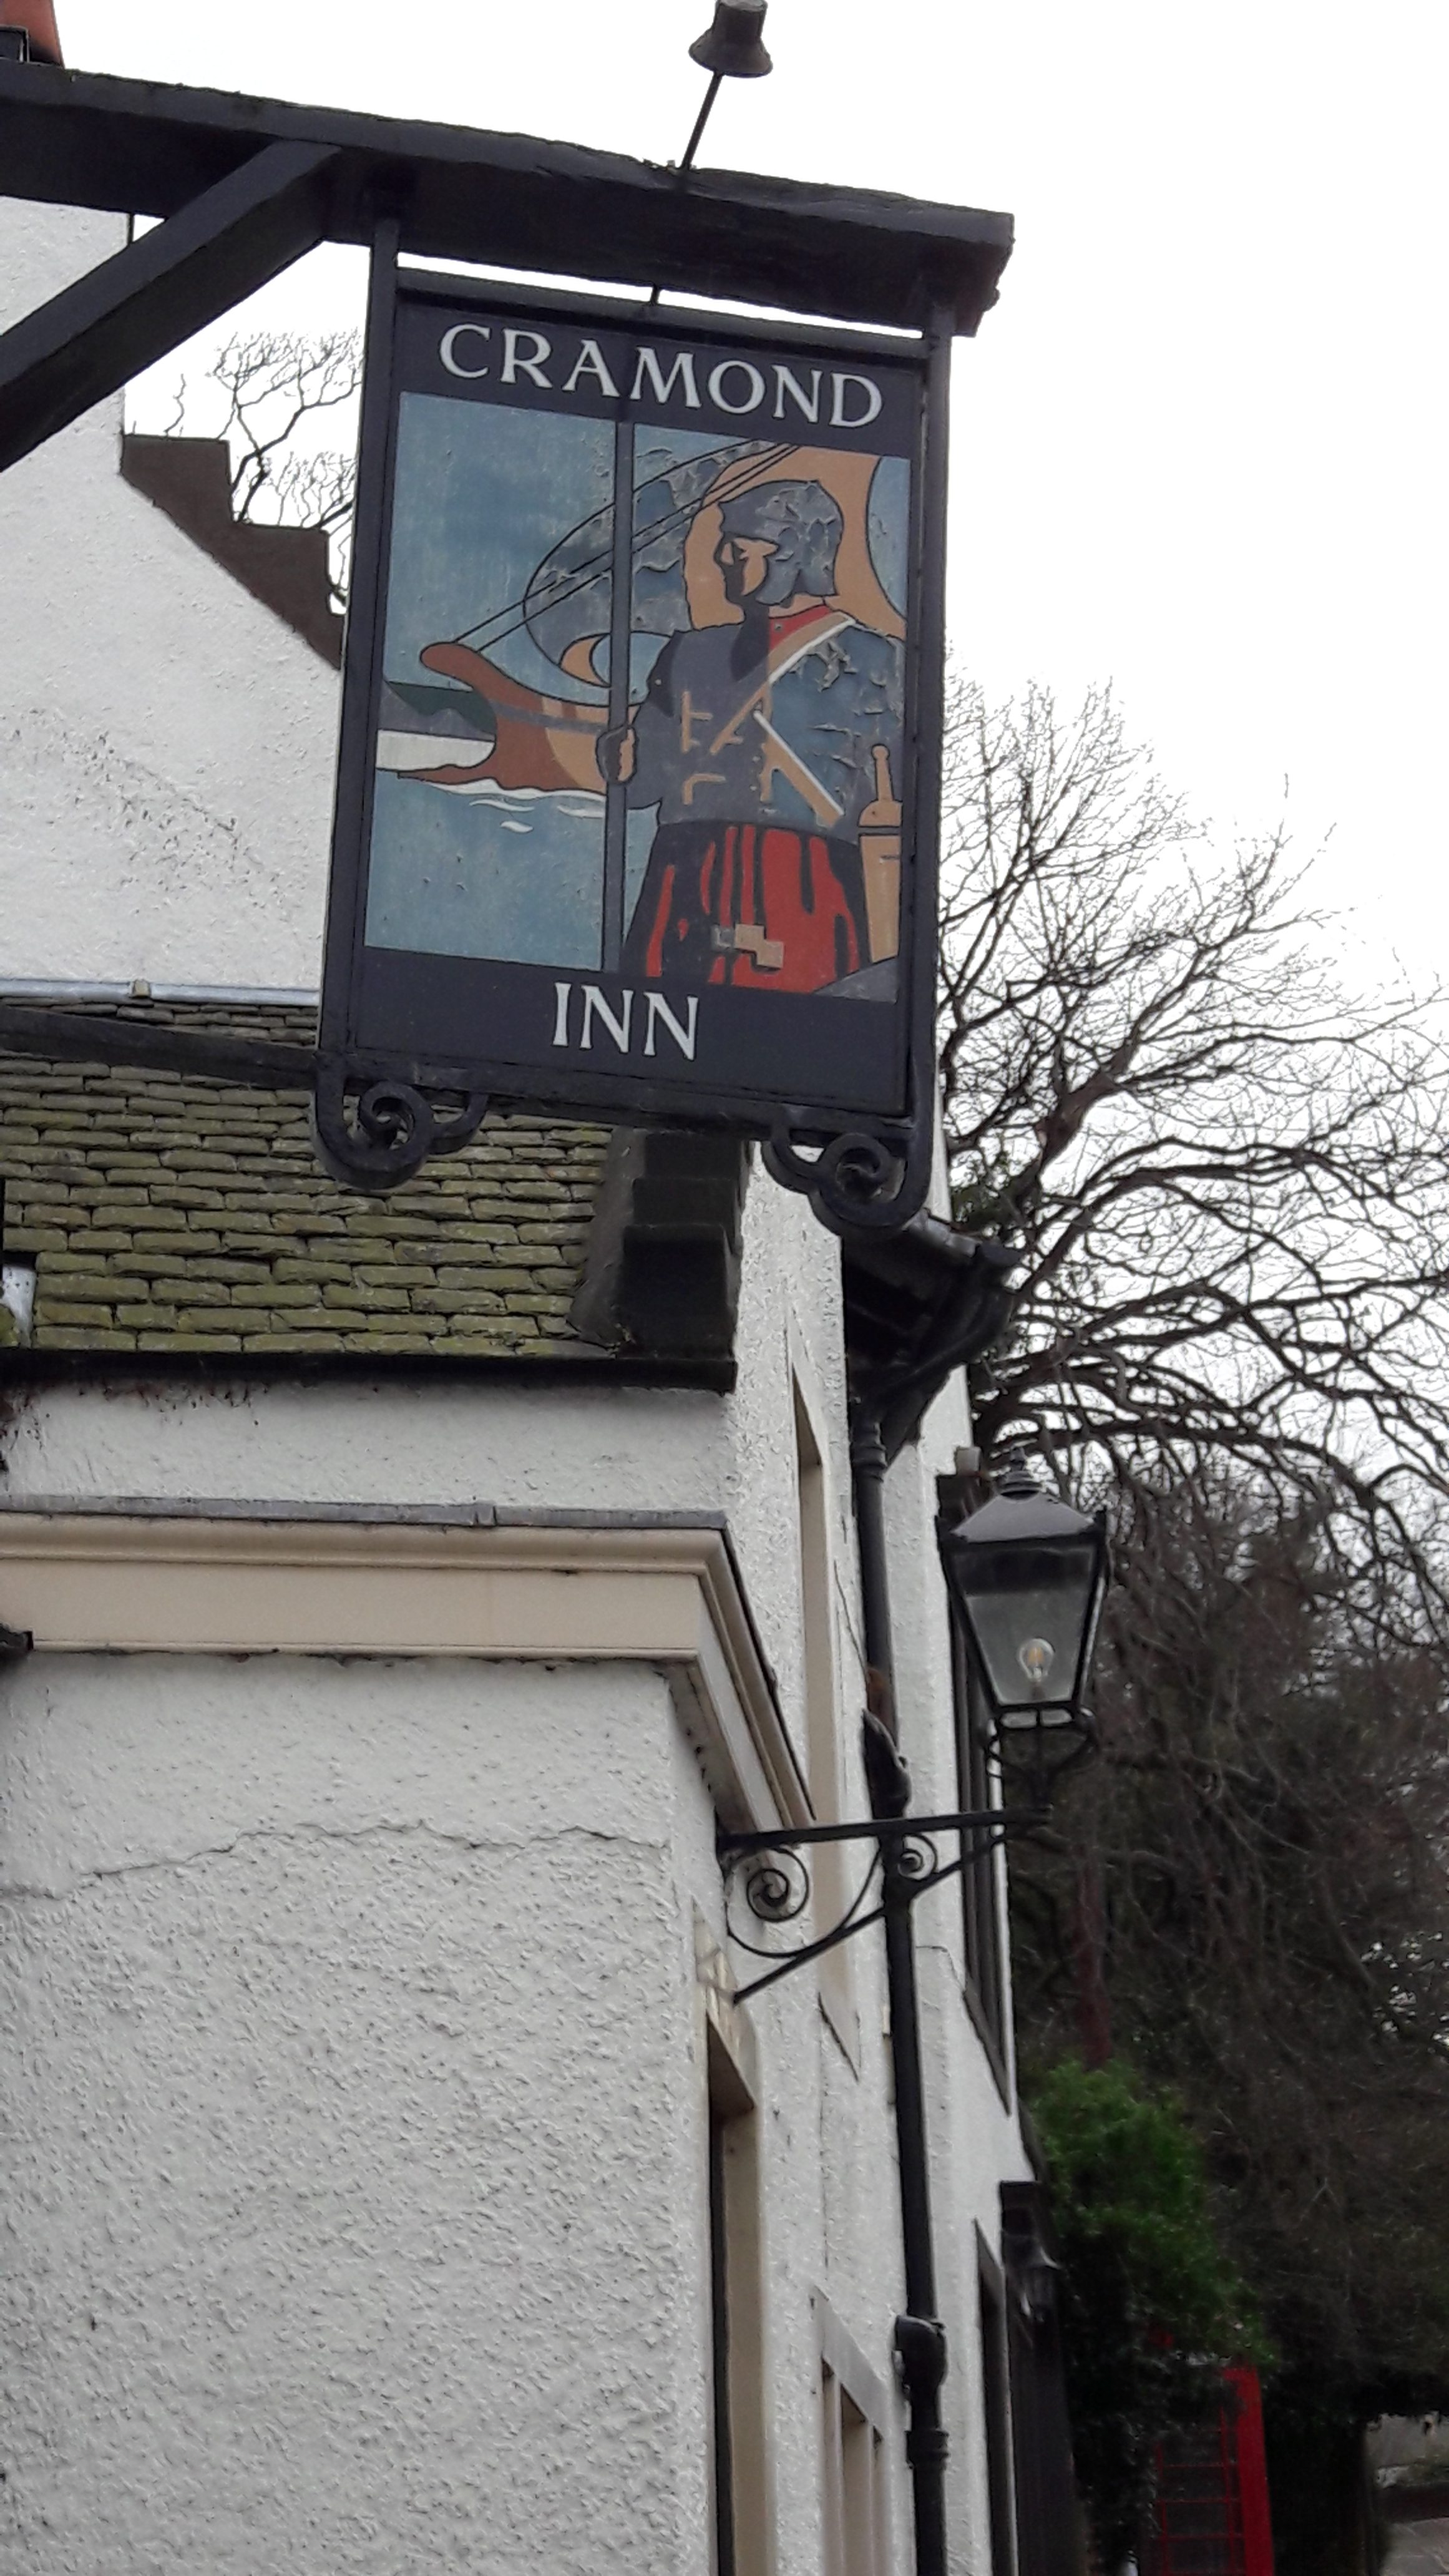 Cramond Inn 11.3.17